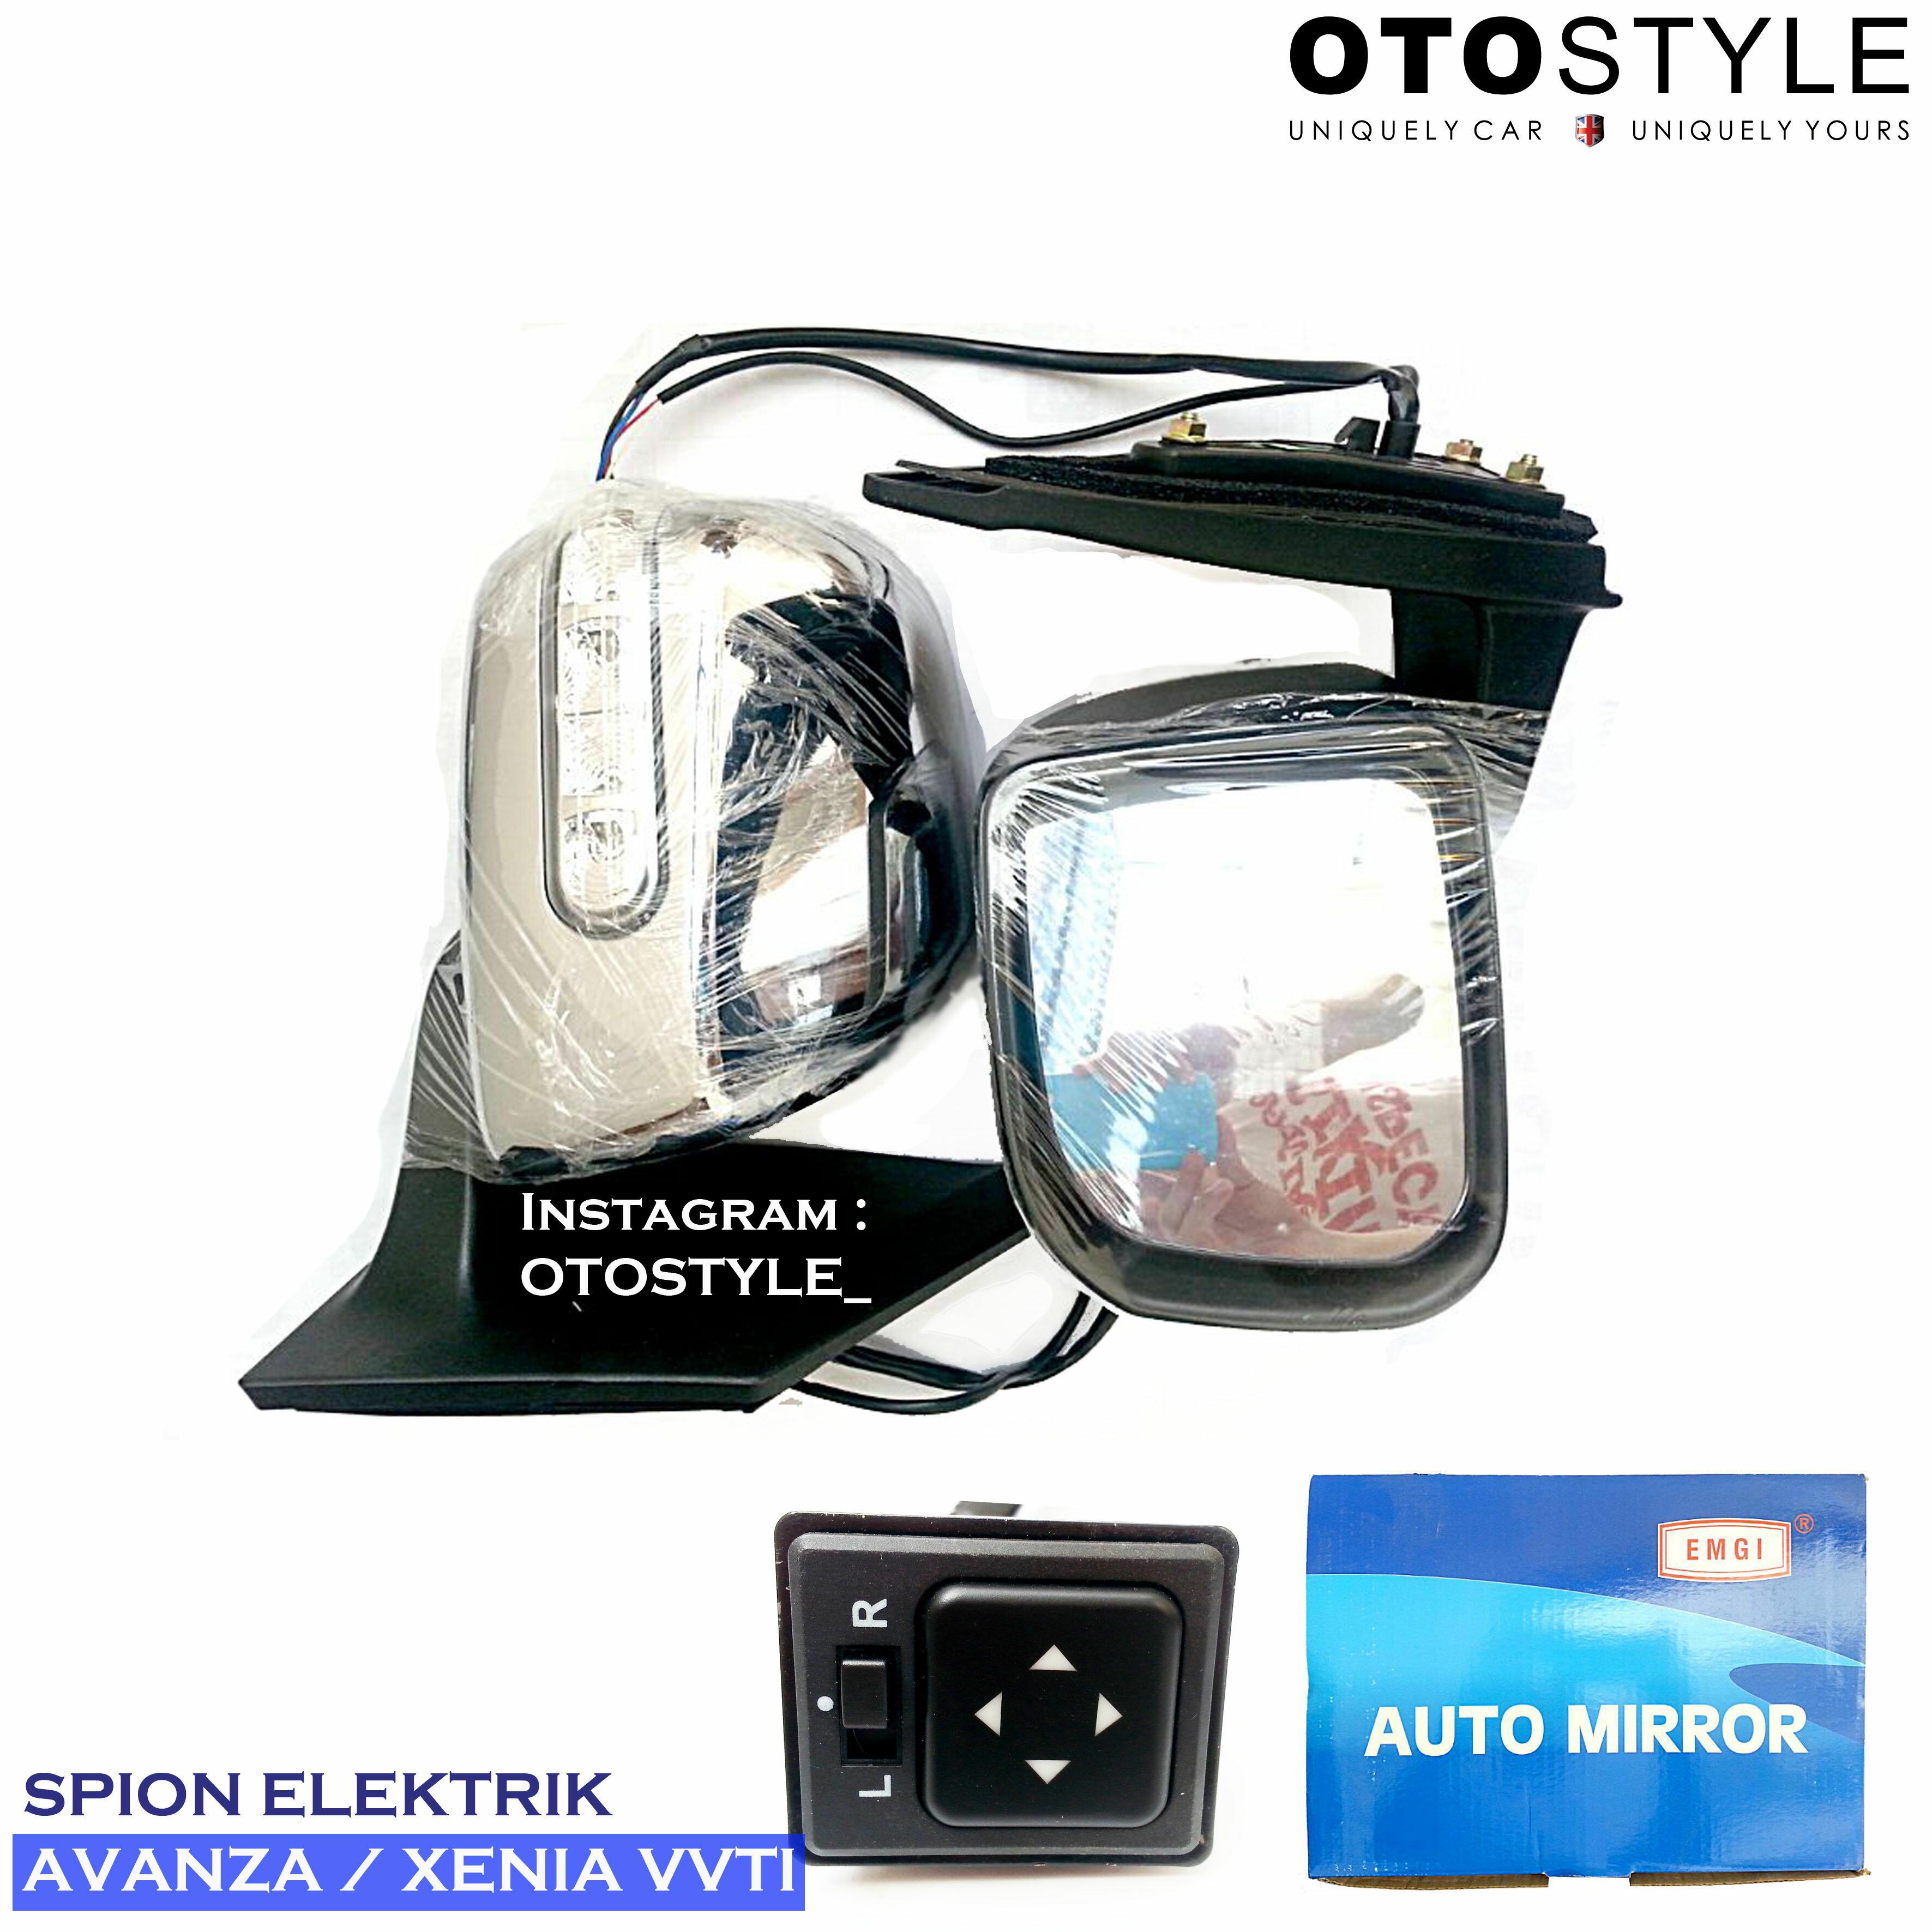 Spion Elektrik / Lipat Toyota Avanza/xenia Vvti Emgi, Auto Retract - Otostyle